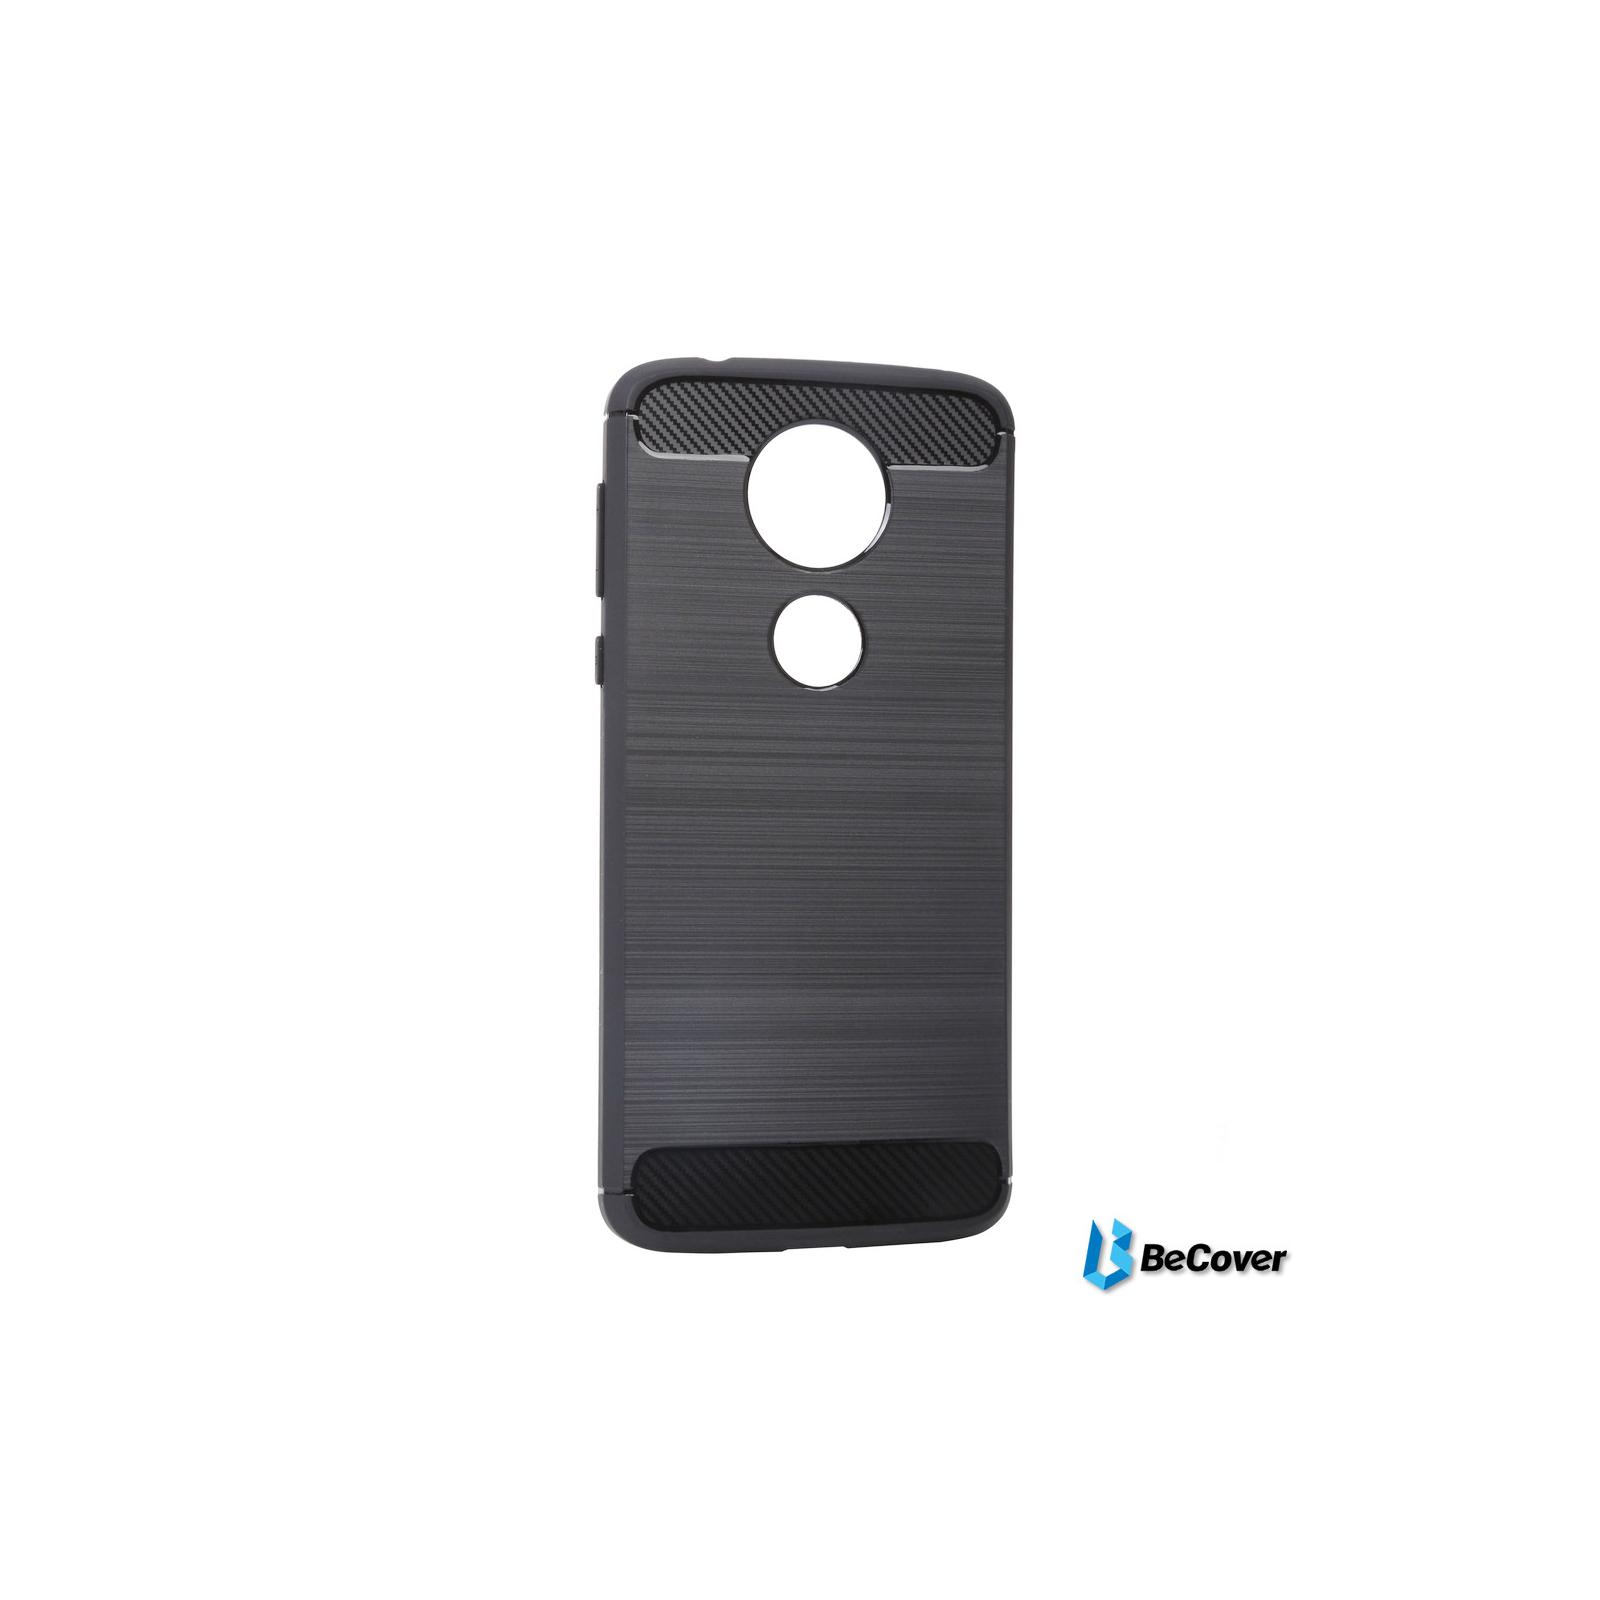 Чехол для моб. телефона BeCover Motorola Moto E5 Plus (XT1924-1) Black (702779)